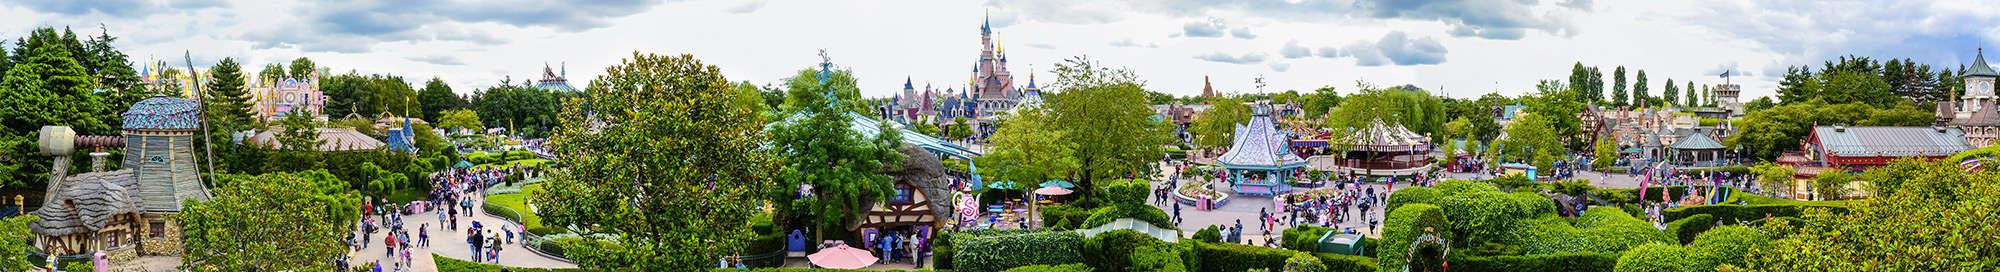 Week end e soggiorni Parco Disneyland® Paris